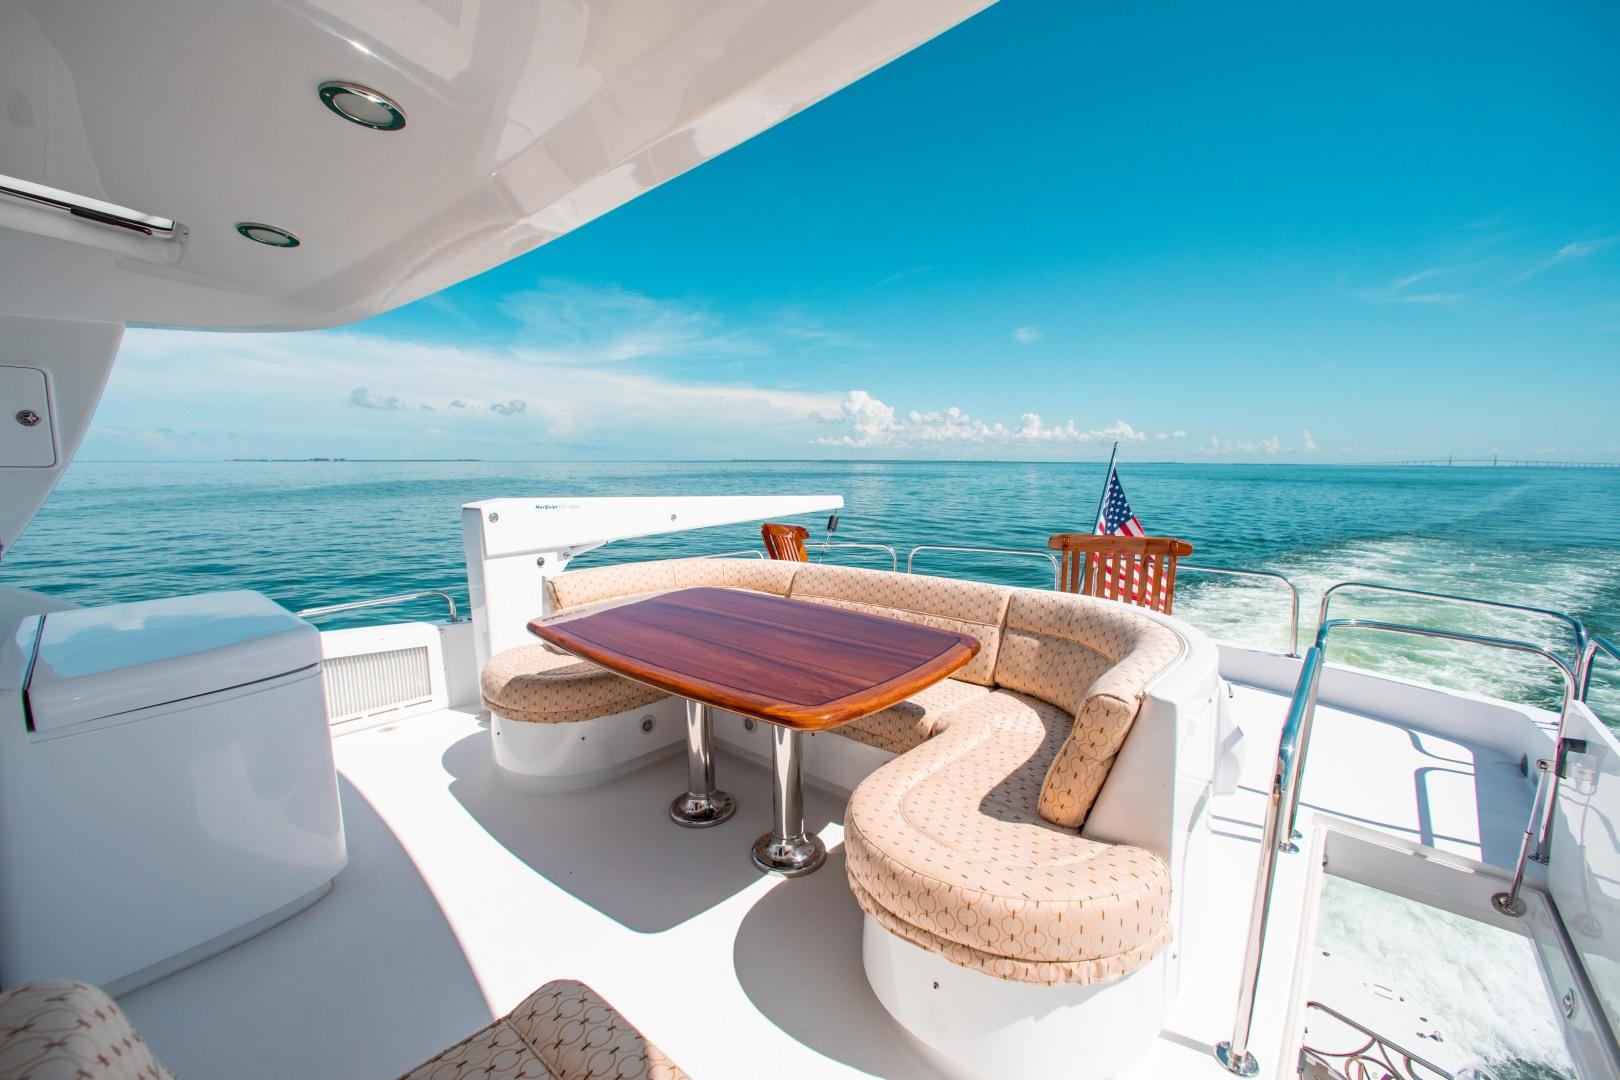 Hatteras-80 Motor Yacht 2008-Galati Yacht Sales Trade Anna Maria-Florida-United States-2008 Hatteras 80 Motor Yacht  Galati Yacht Sales Trade  Skylounge Aft Deck-1466256 | Thumbnail